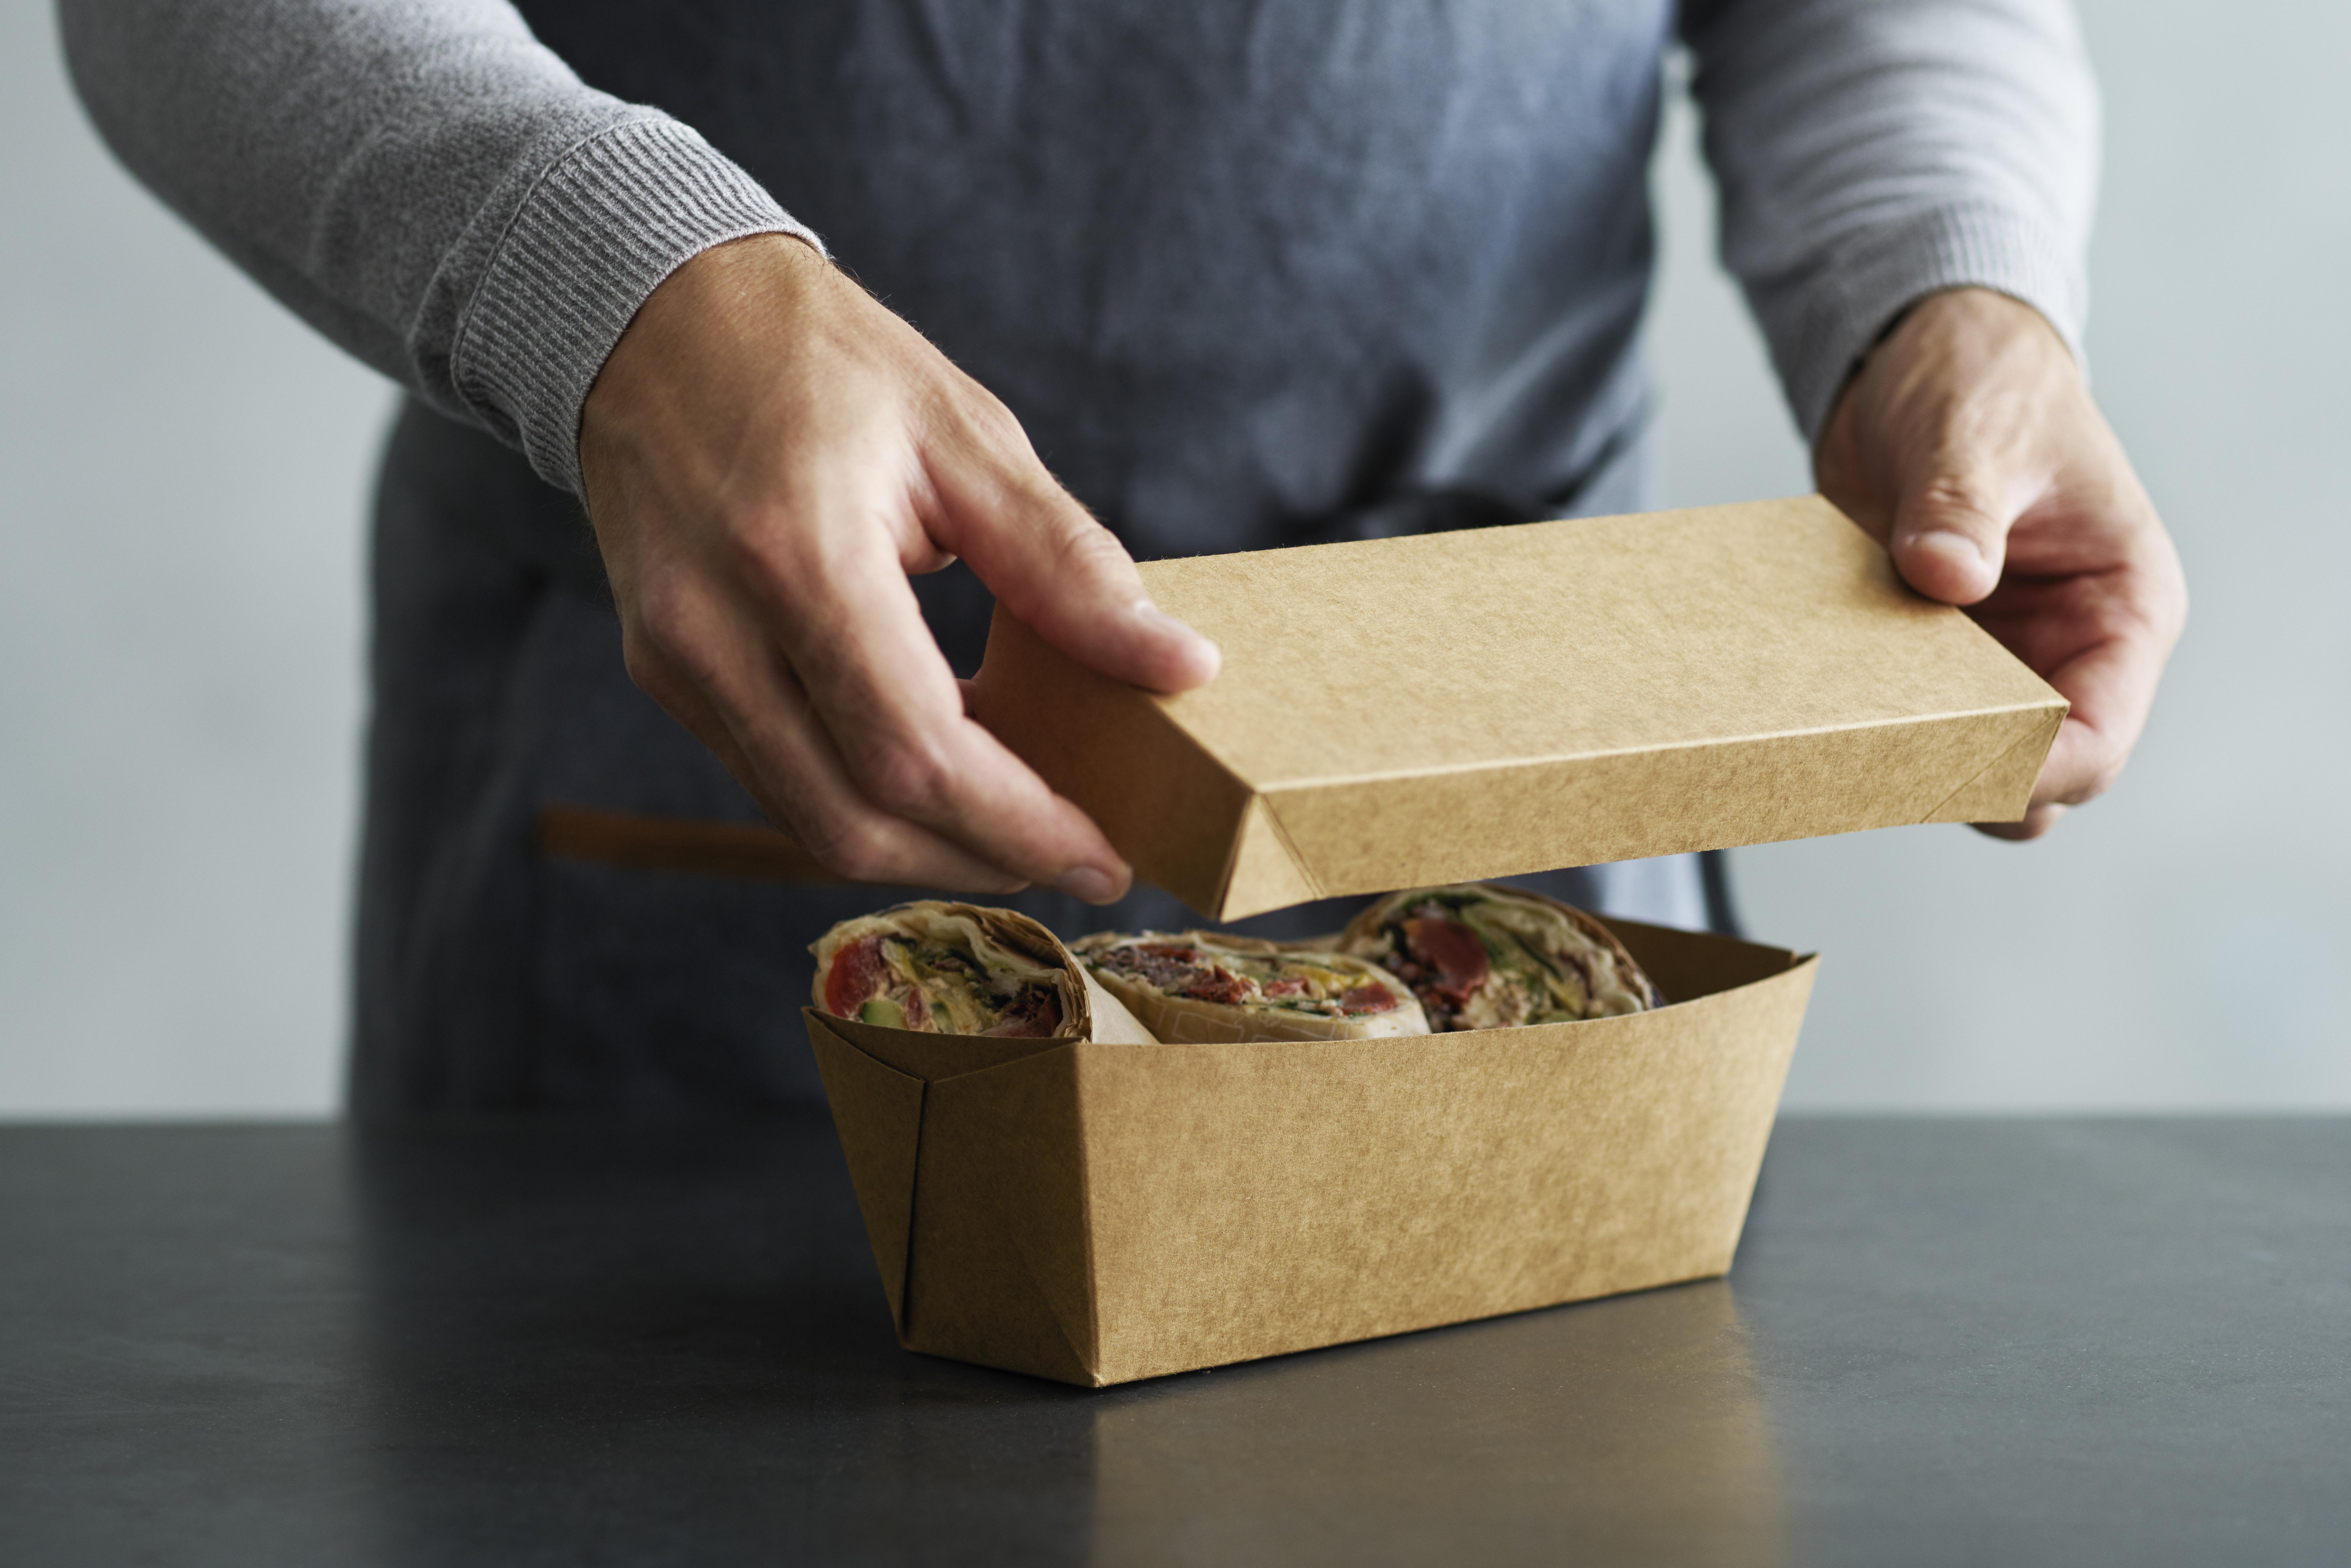 Cajas con tapa para transporte de alimentos